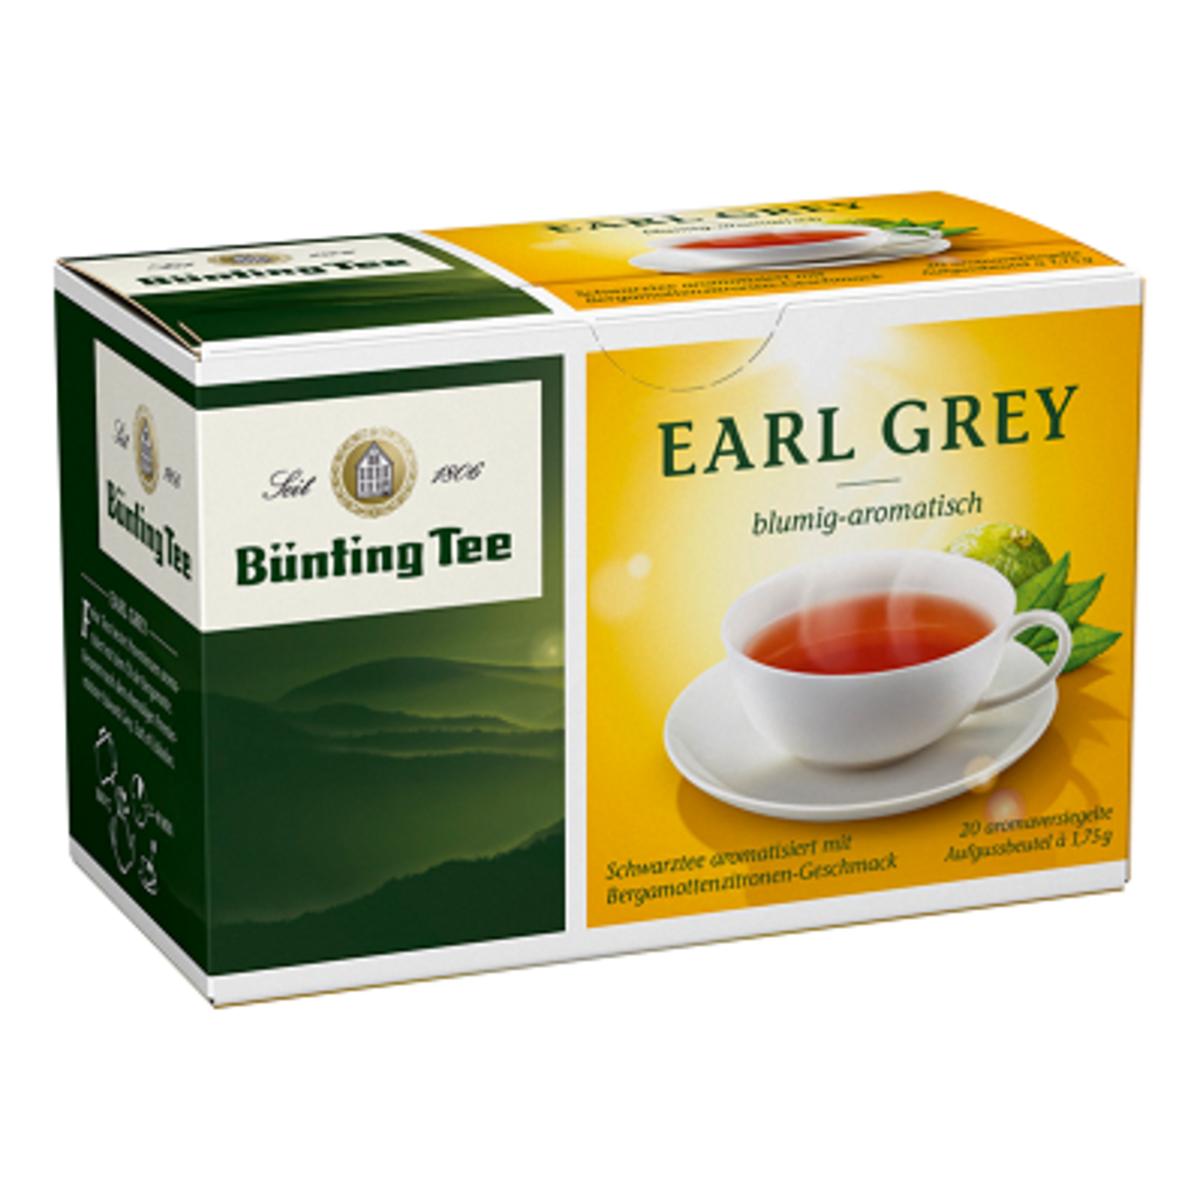 Bünting Tee Earl Grey 20 бр сашета